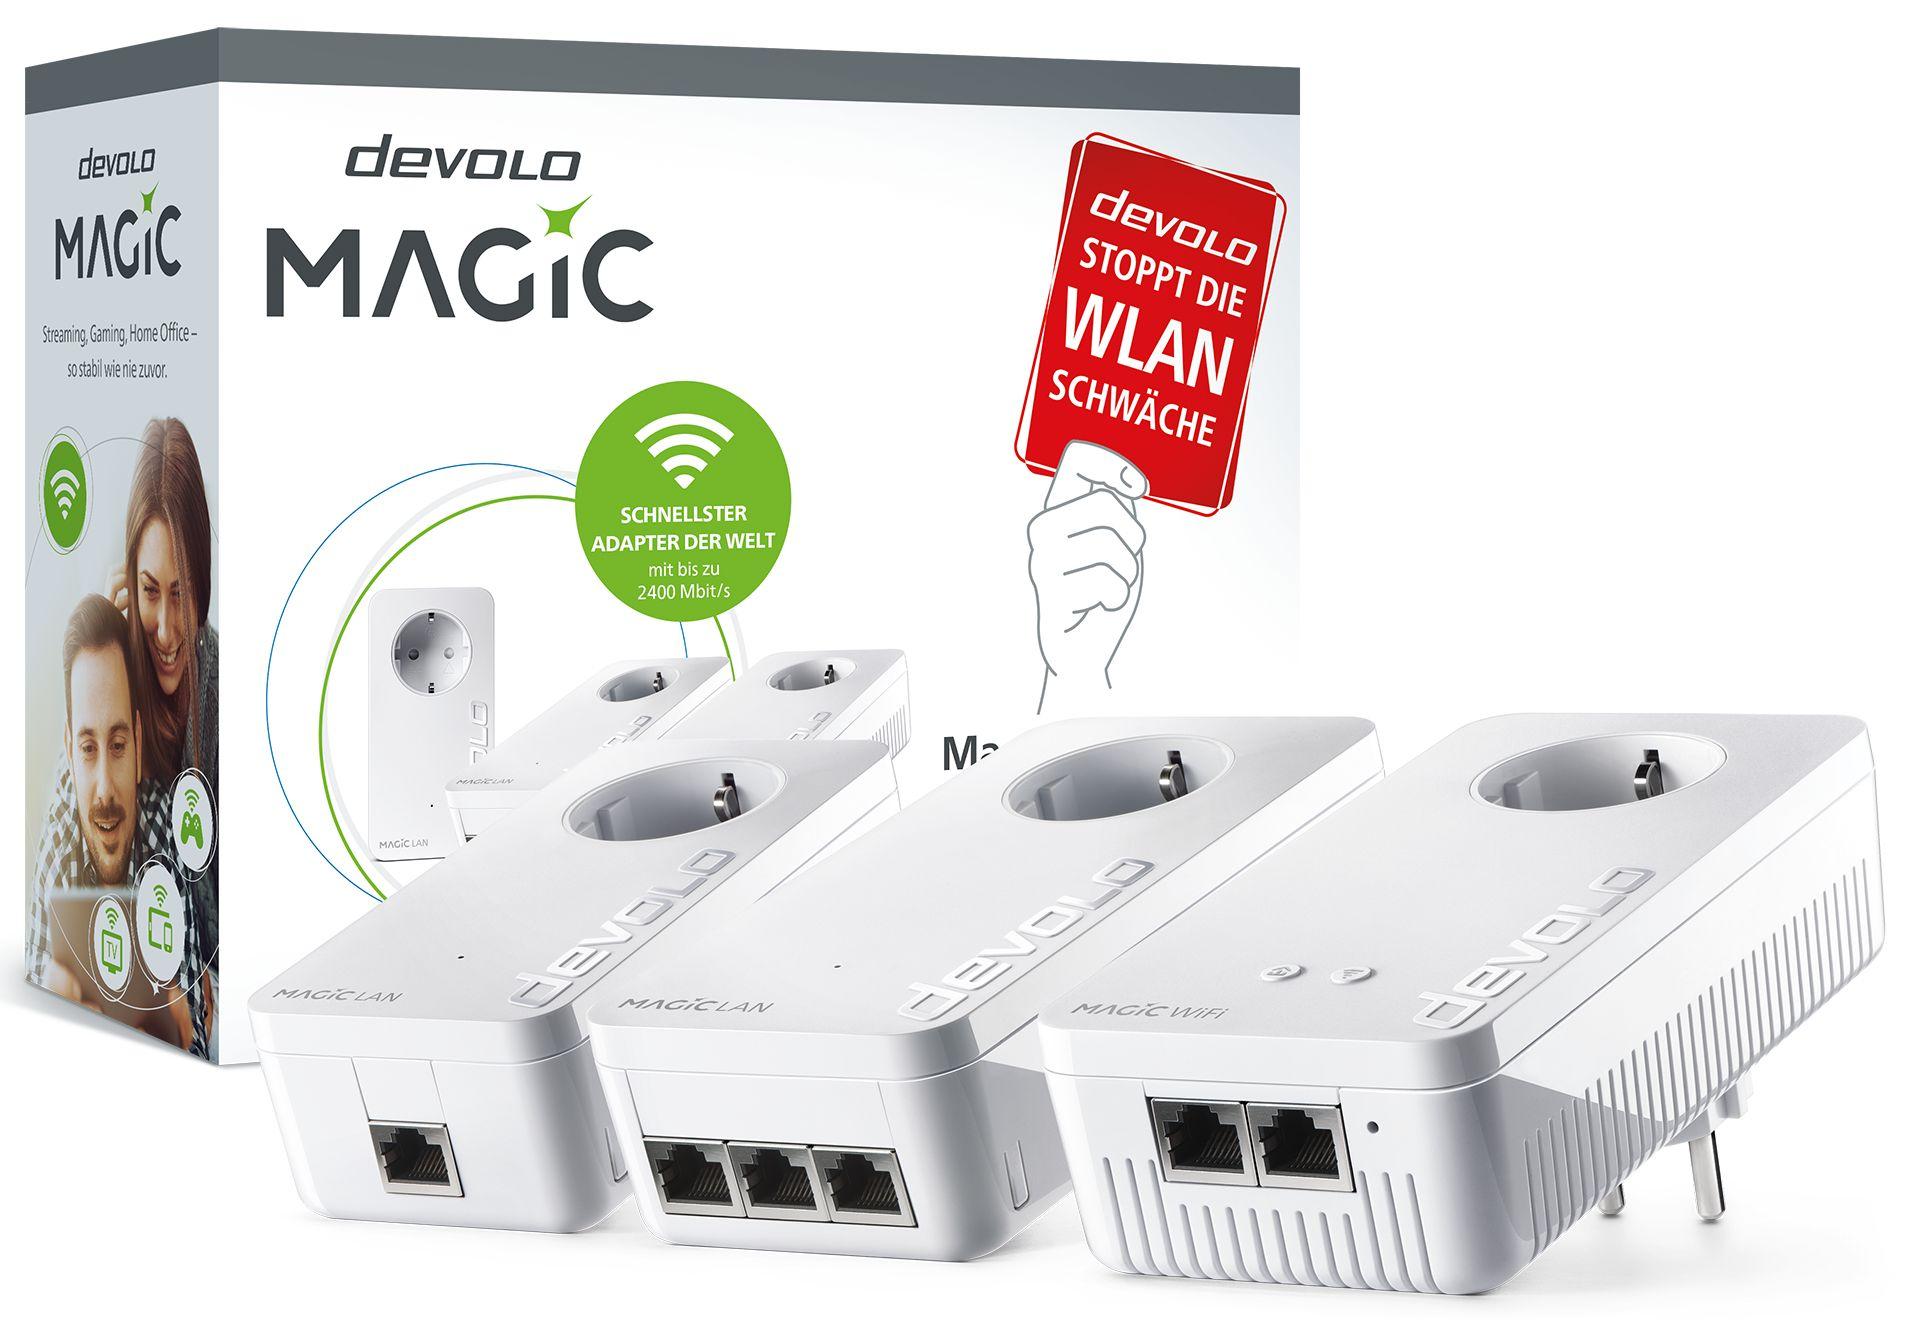 devolo Magic 2 Wifi Streaming Kit (Magic 2 LAN, Magic 2 LAN triple & Magic 2 WiFi next)